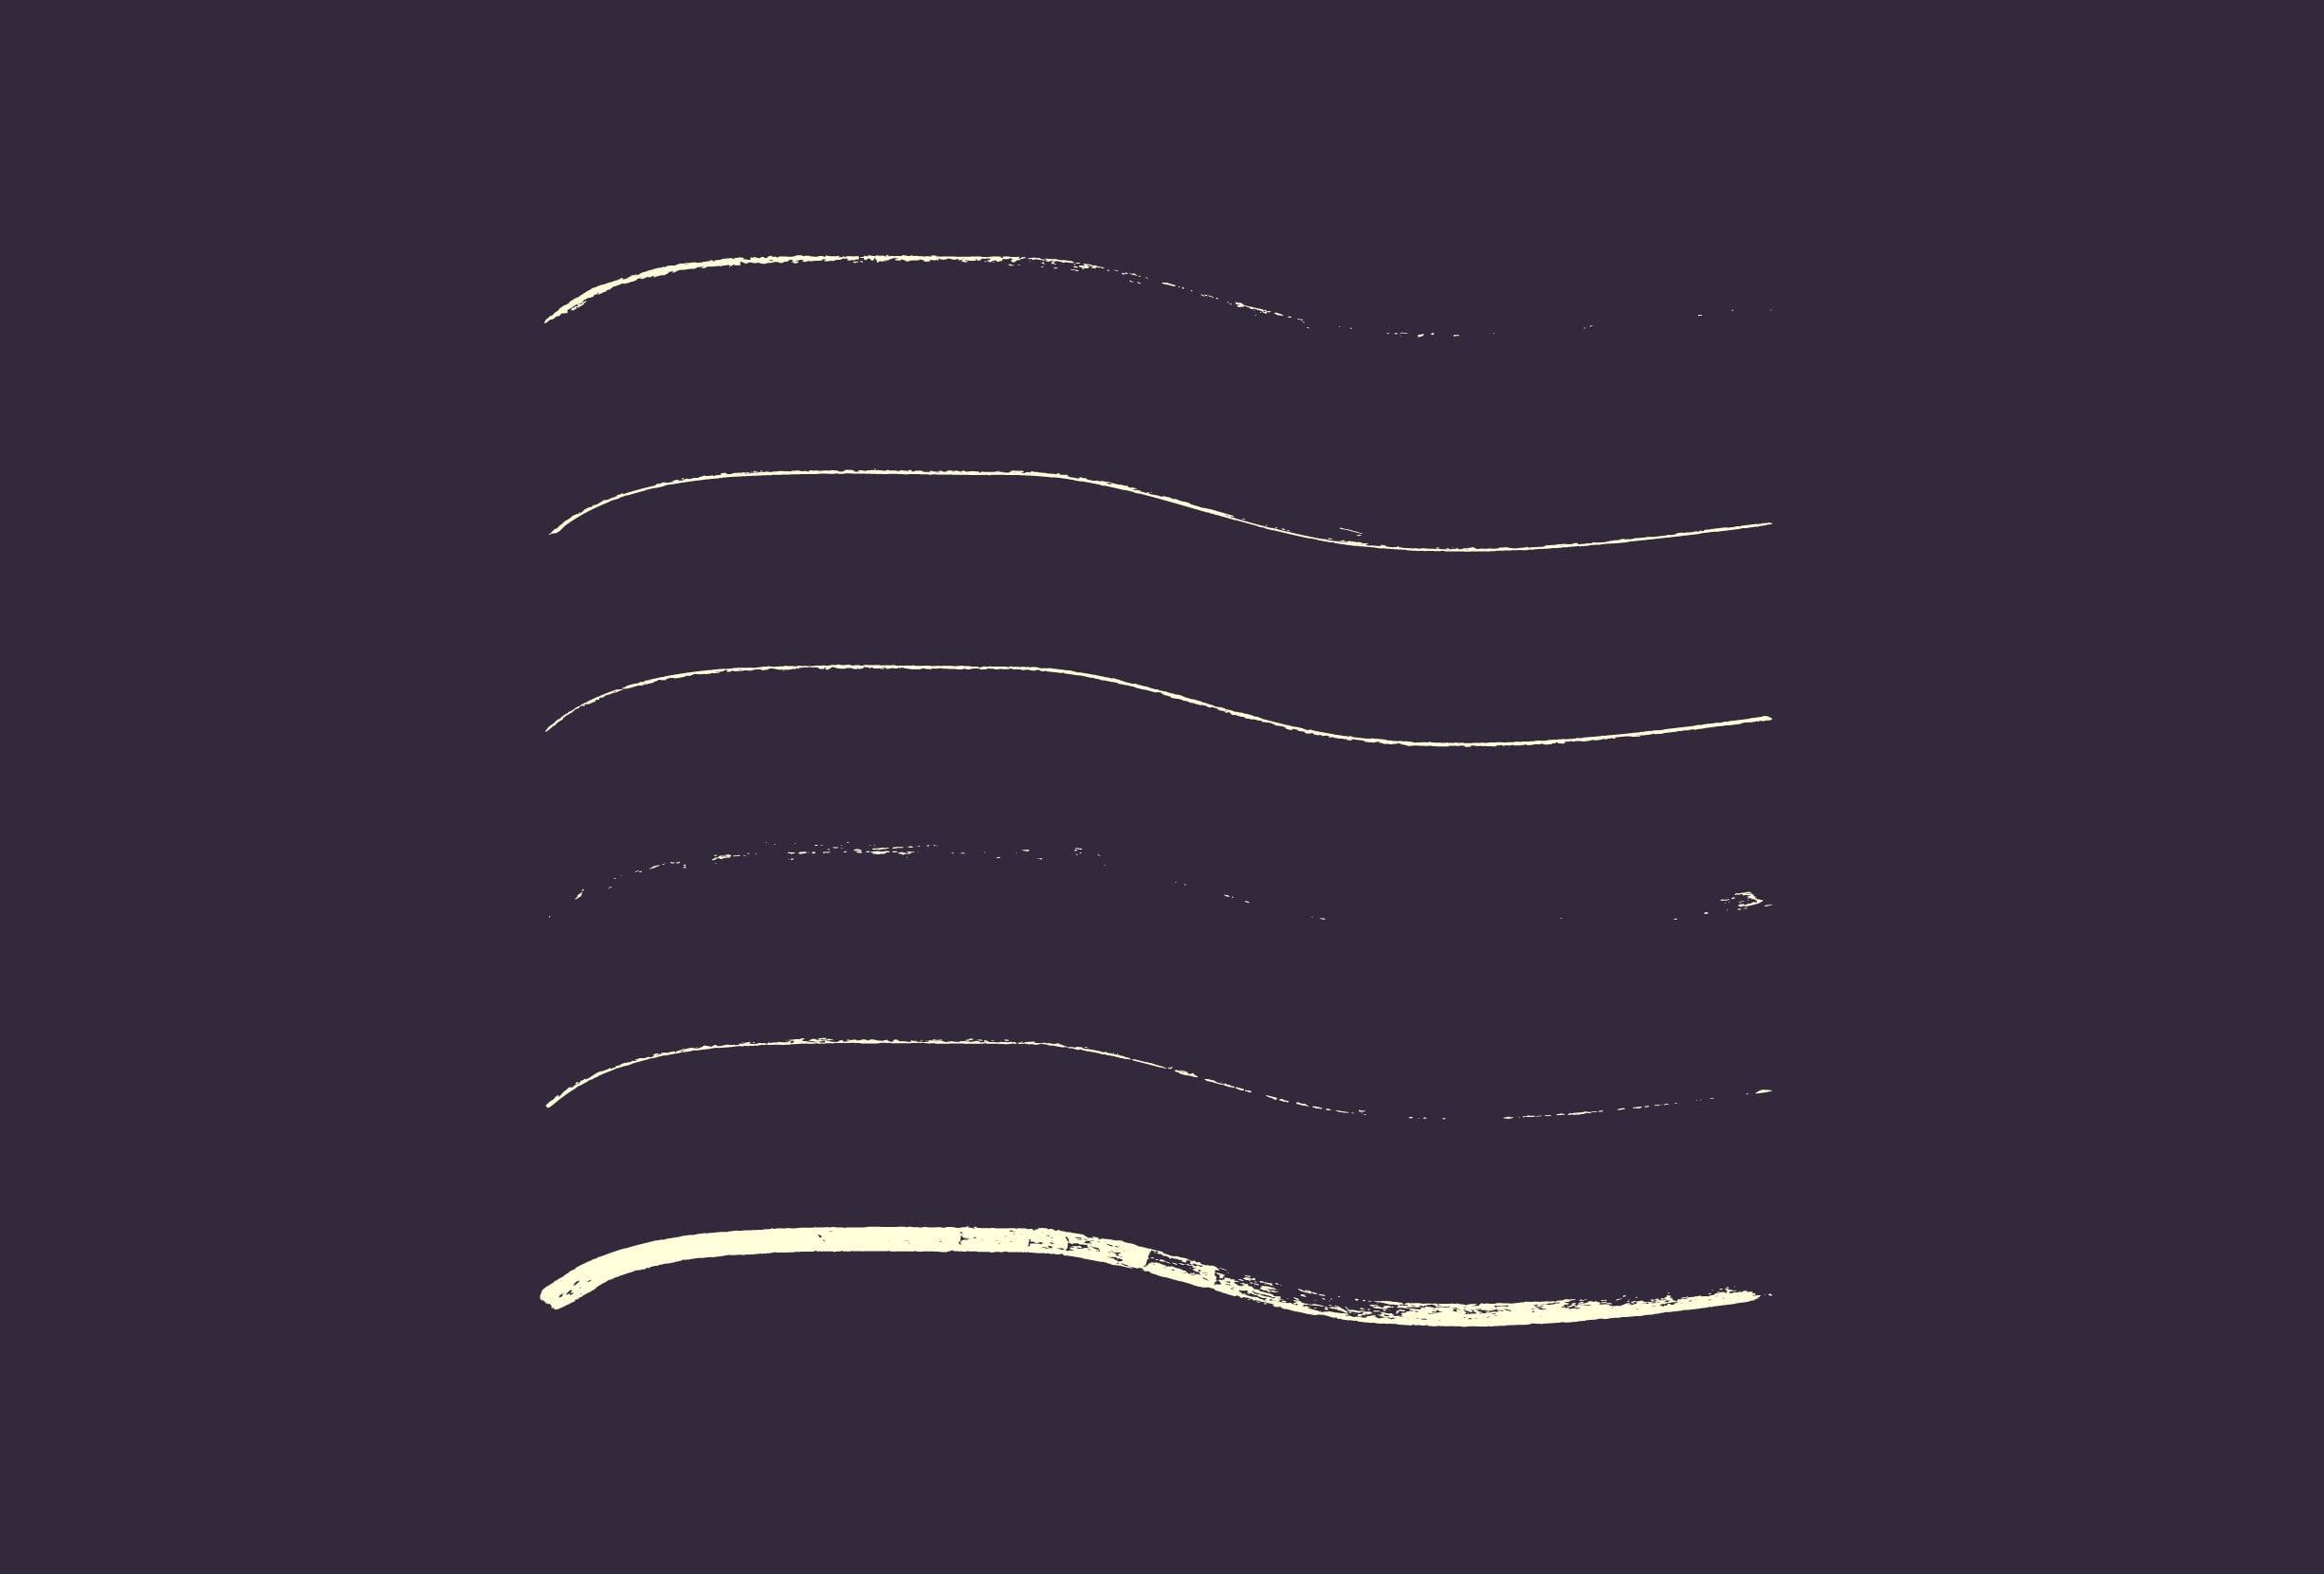 30 Best Line Art Illustrator Brushes (Wax Crayons) - brushes presentation 3 0